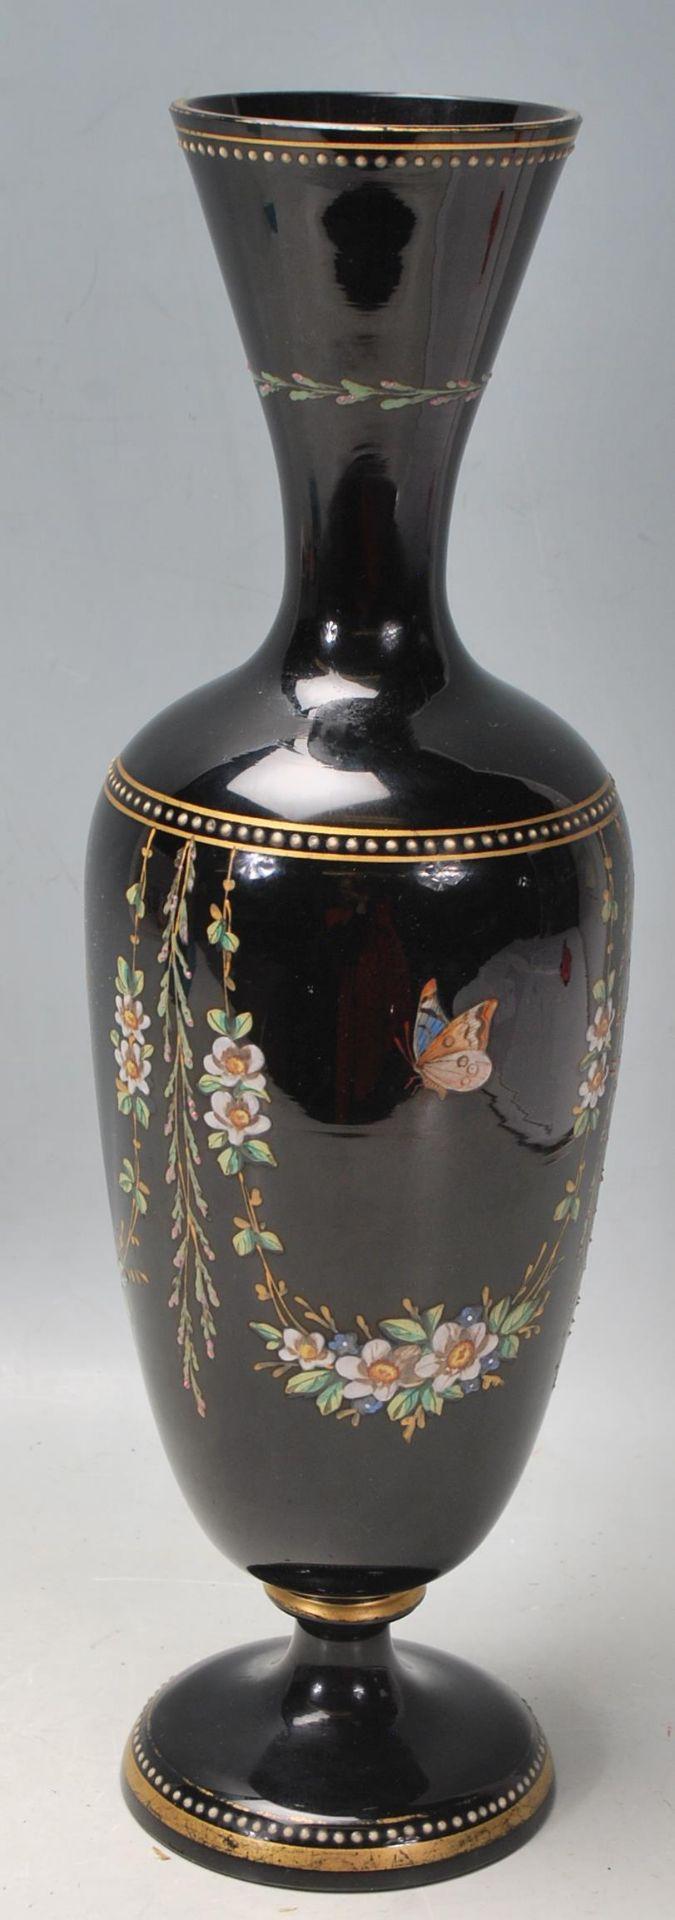 ANTIQUE BLACK AMETHYST BOHEMIAN GLASS VASE - Image 4 of 7